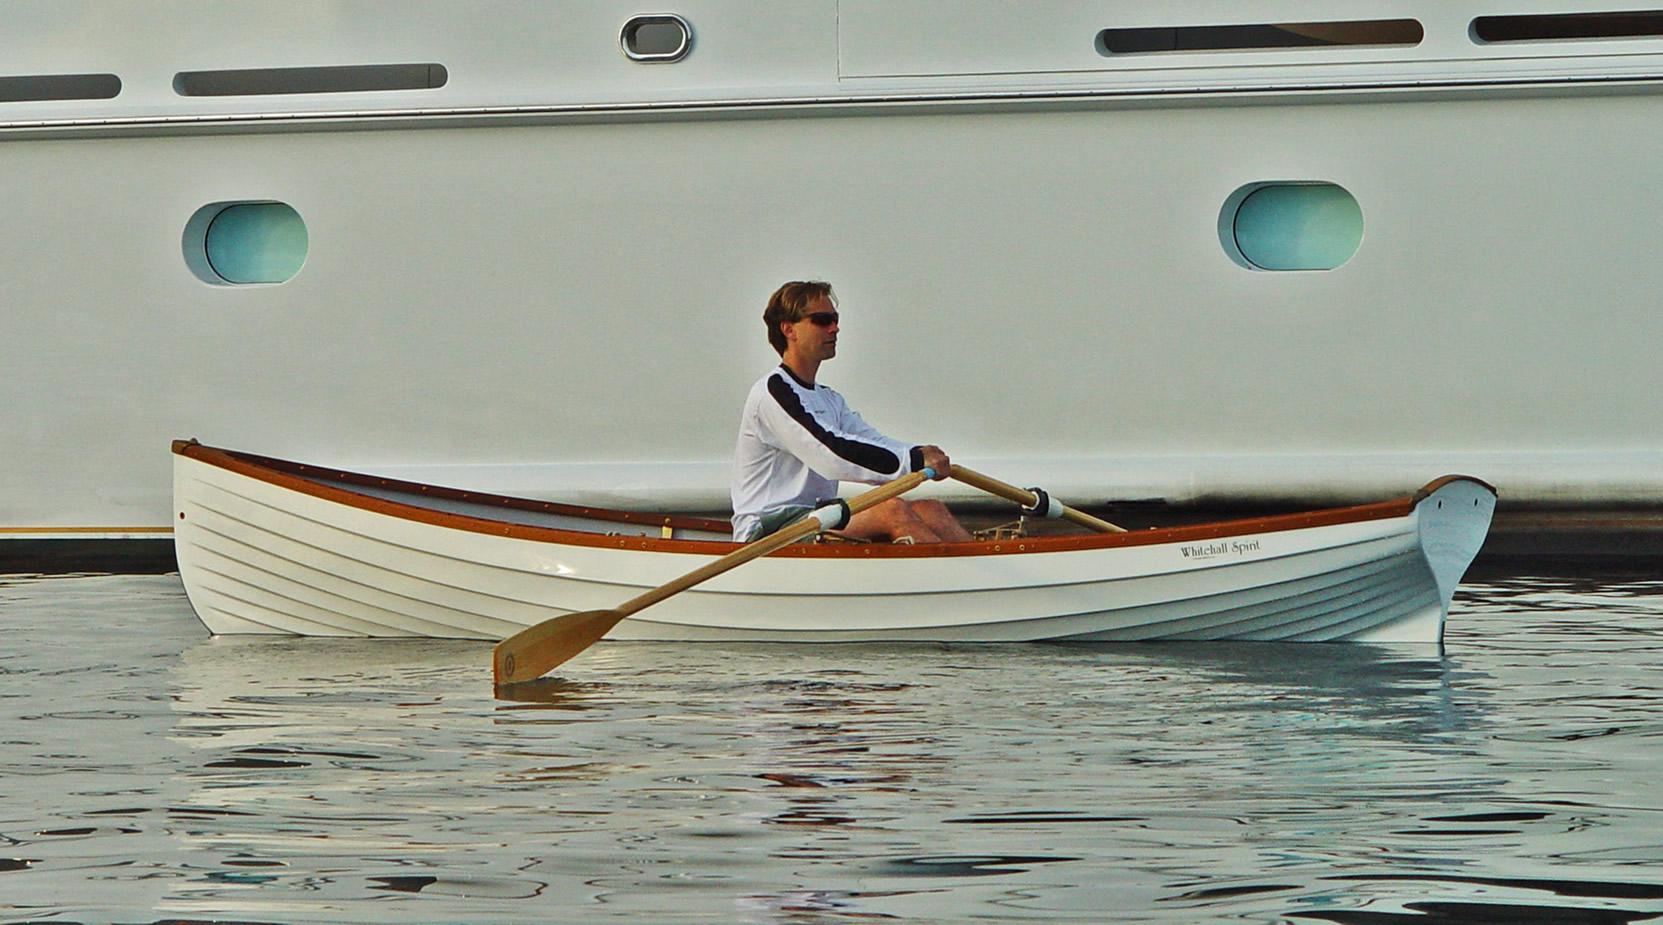 classic-whitehall-spirit-14-single-slide-seat-sculling-rowboat-DSC02657